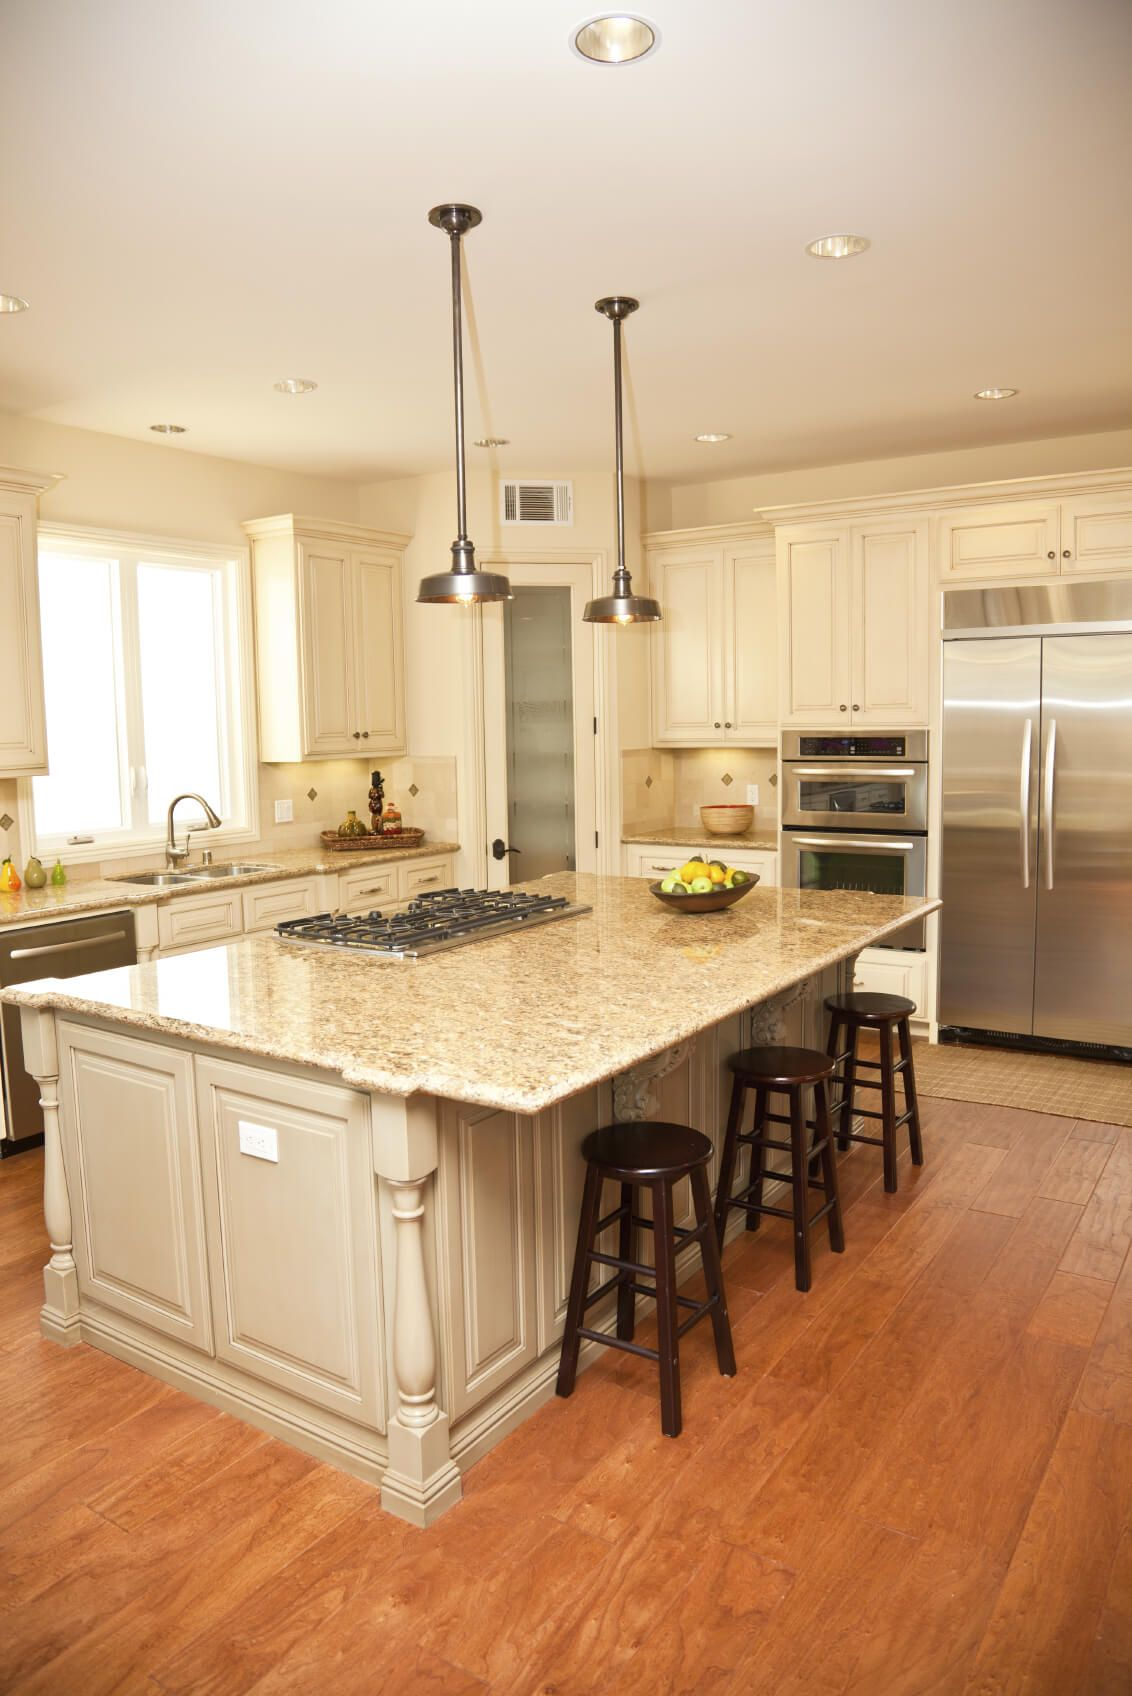 Prefab Kitchen Island With Stove